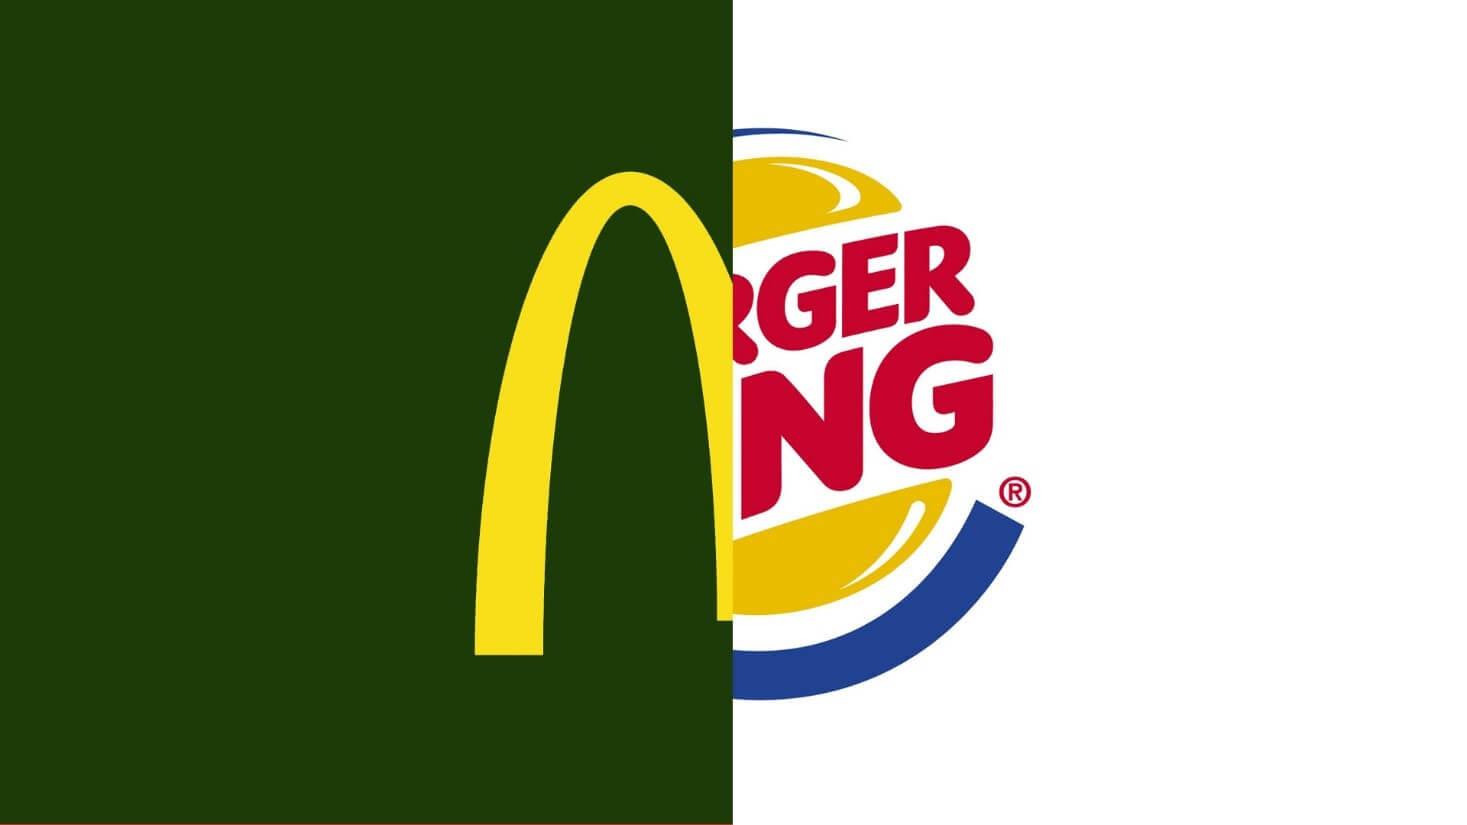 mc donalds ve burger king